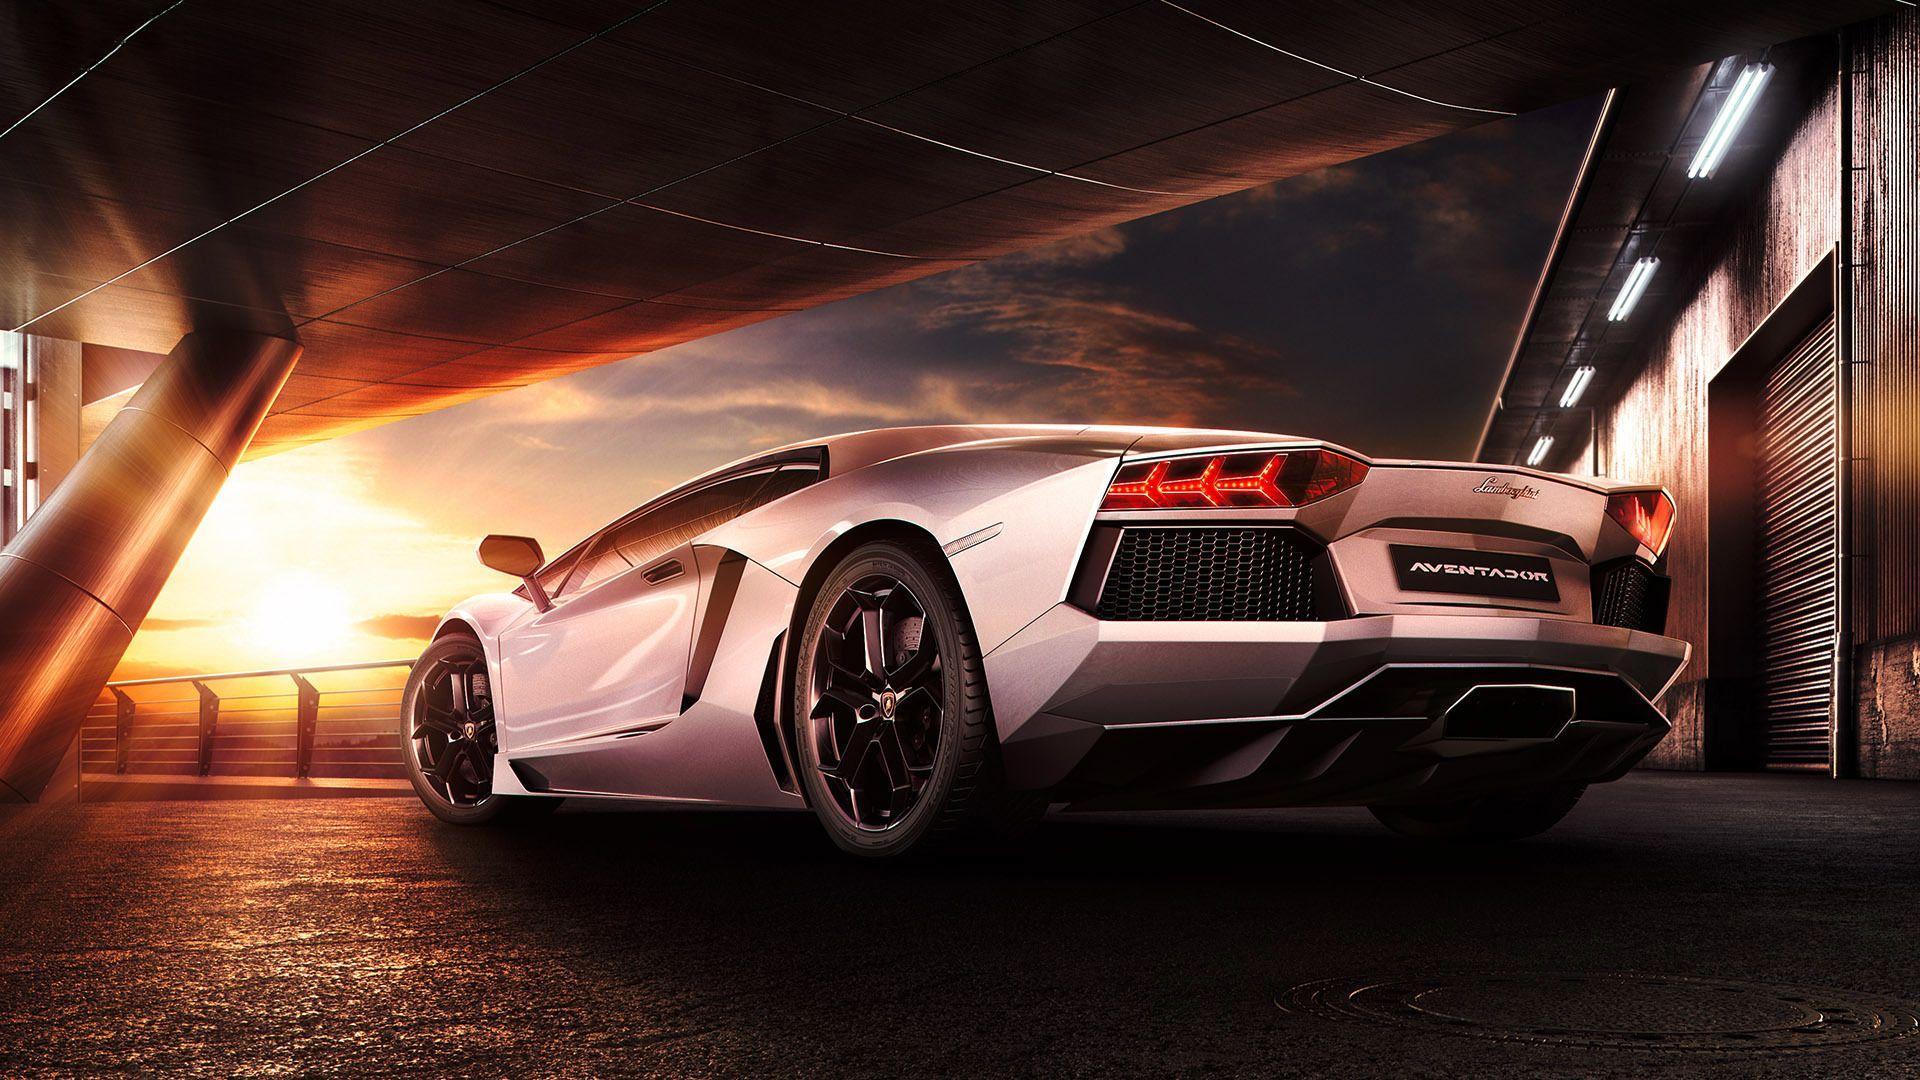 Lamborghiniaventadorlp700410 hdg 19201080 pixels cars lamborghiniaventadorlp700410 hdg 19201080 pixels voltagebd Image collections